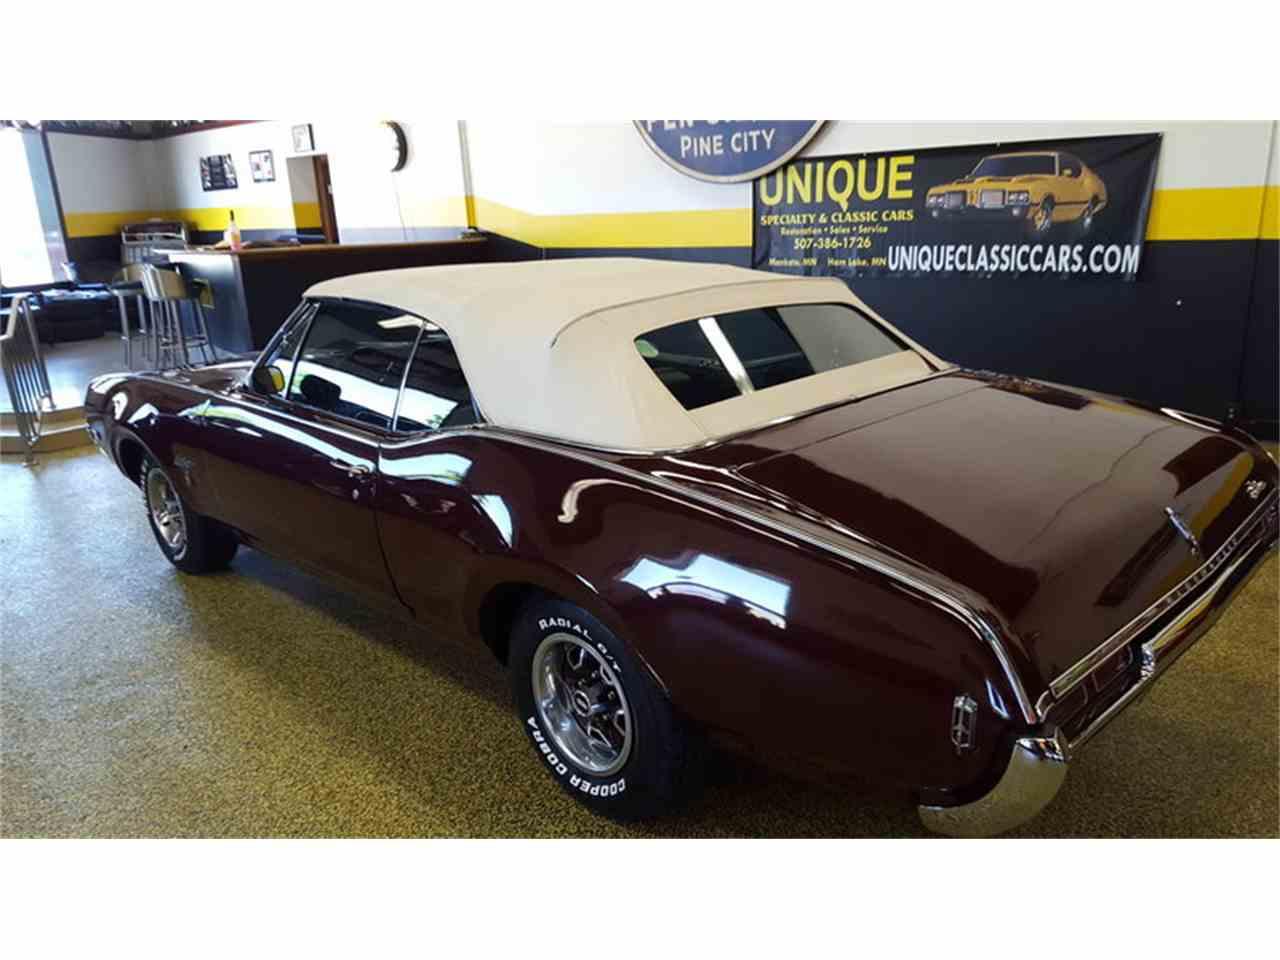 Large Picture of Classic 1968 Cutlass    Convertible located in Mankato Minnesota - $19,900.00 - L9ZI